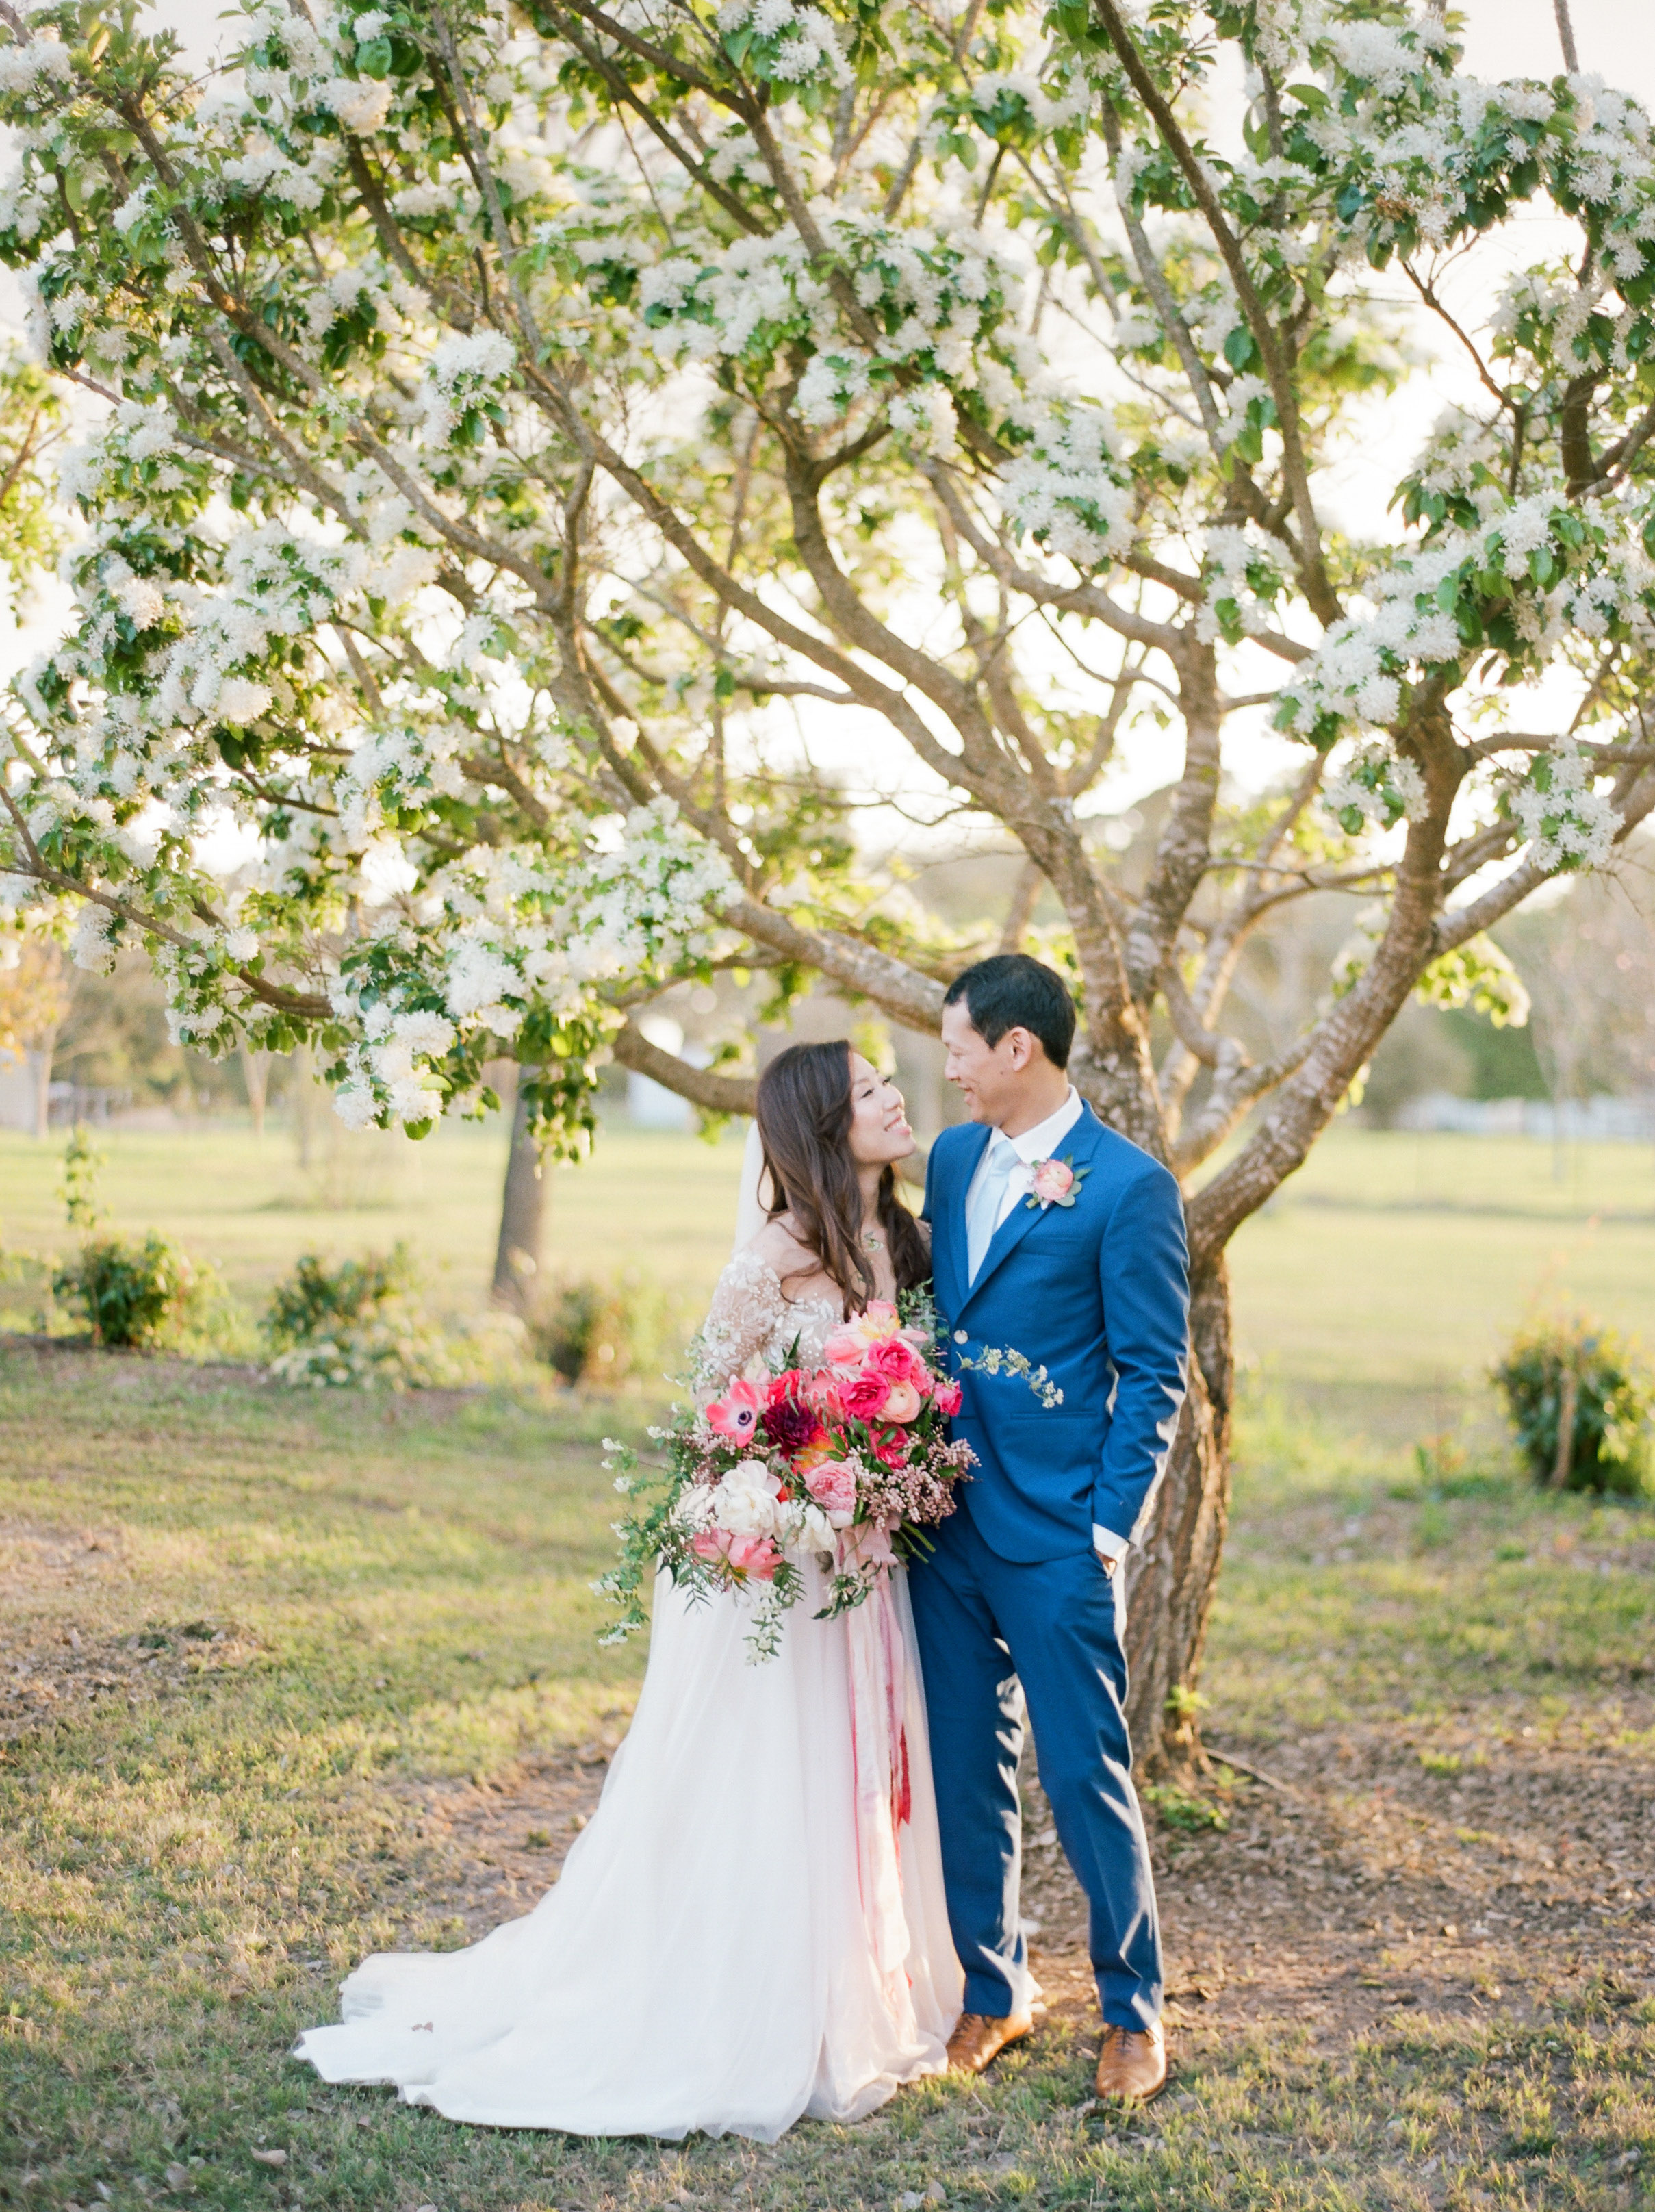 The-Knot-50-Weddings-50-States-Texas-Winner-Dana-Fernandez-photography-houston-wedding-photographer-film-fine-art-destination-1.jpg